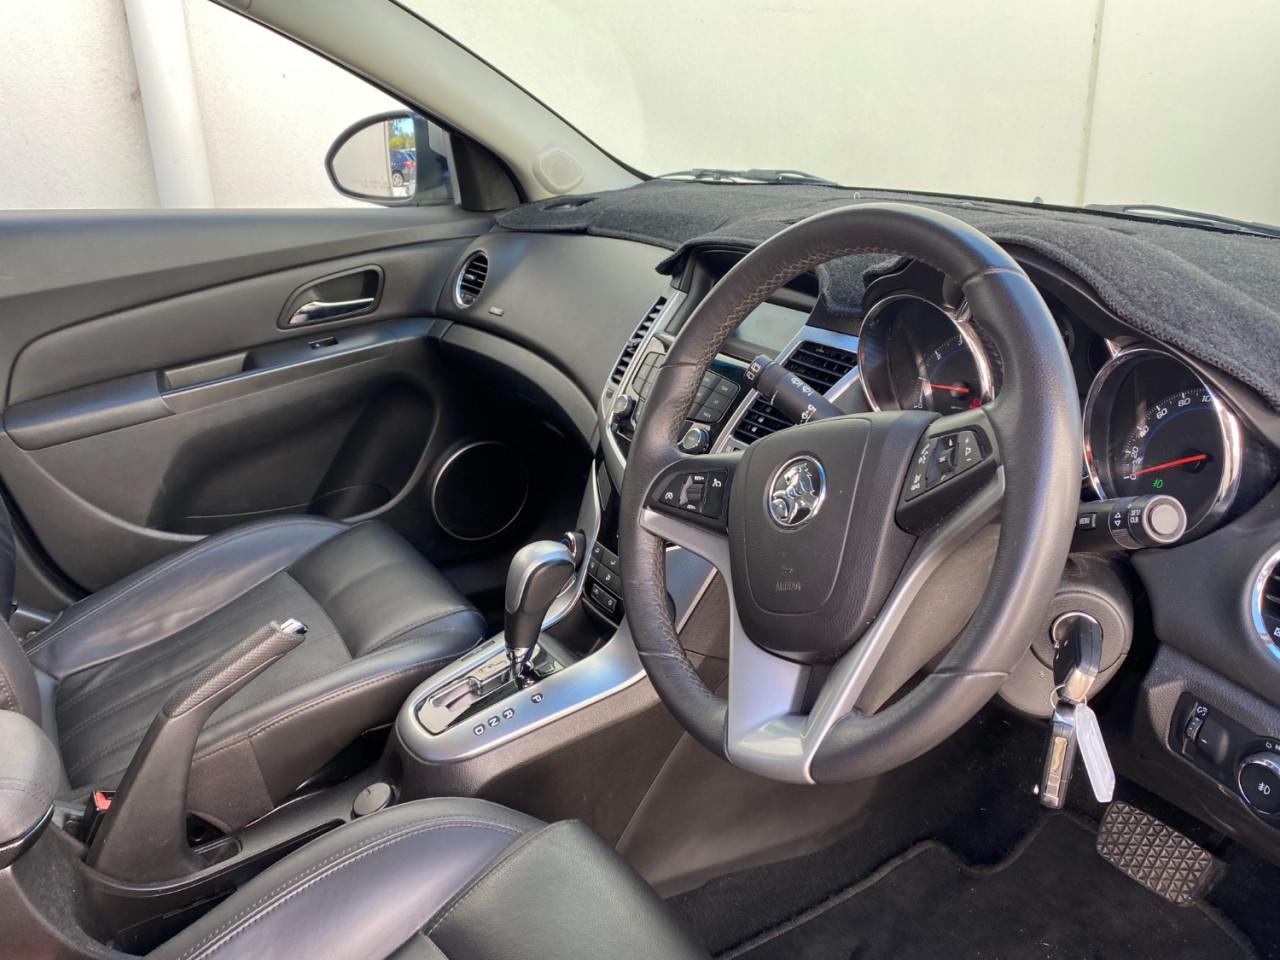 2012 Holden Cruze JH SERIES II MY12 CDX Hatchback Image 3